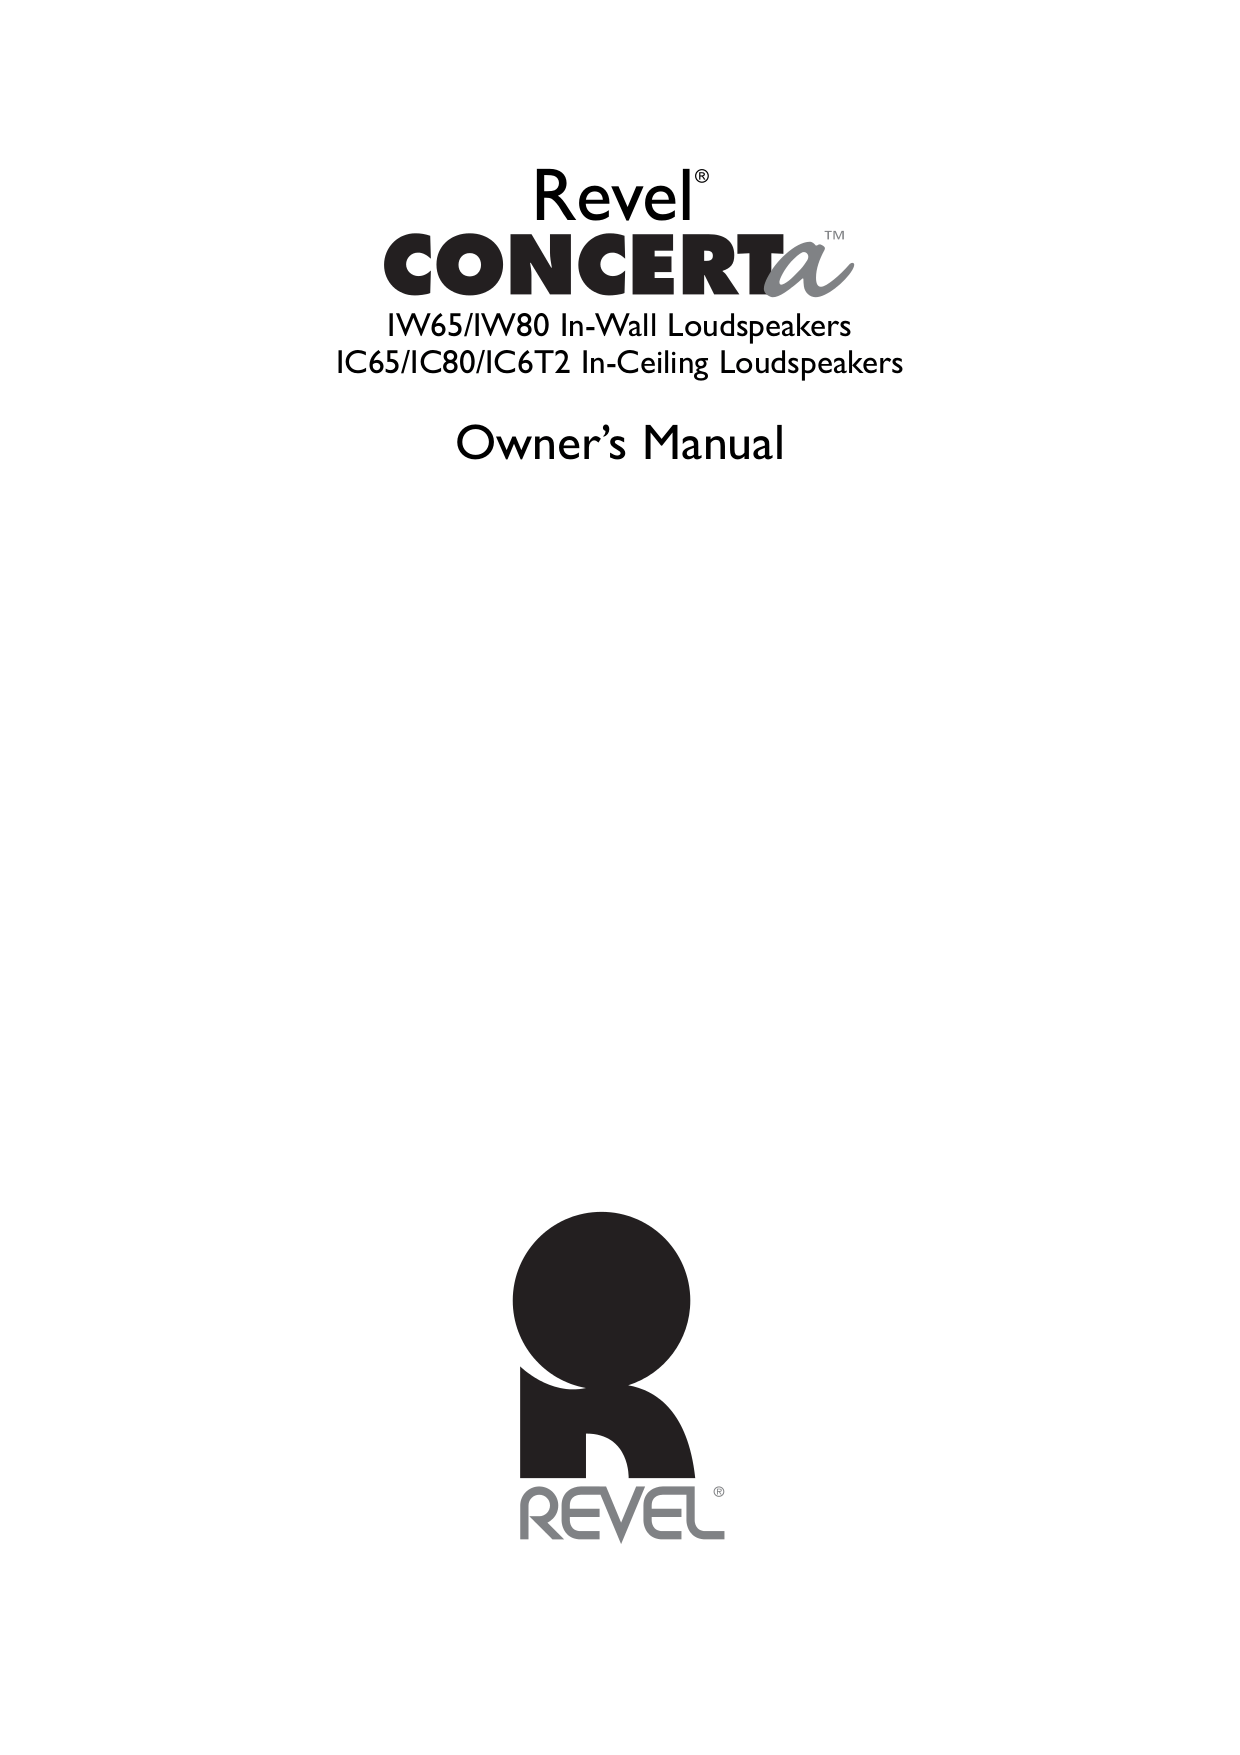 Download free pdf for Revel Concerta IW65 Speaker manual